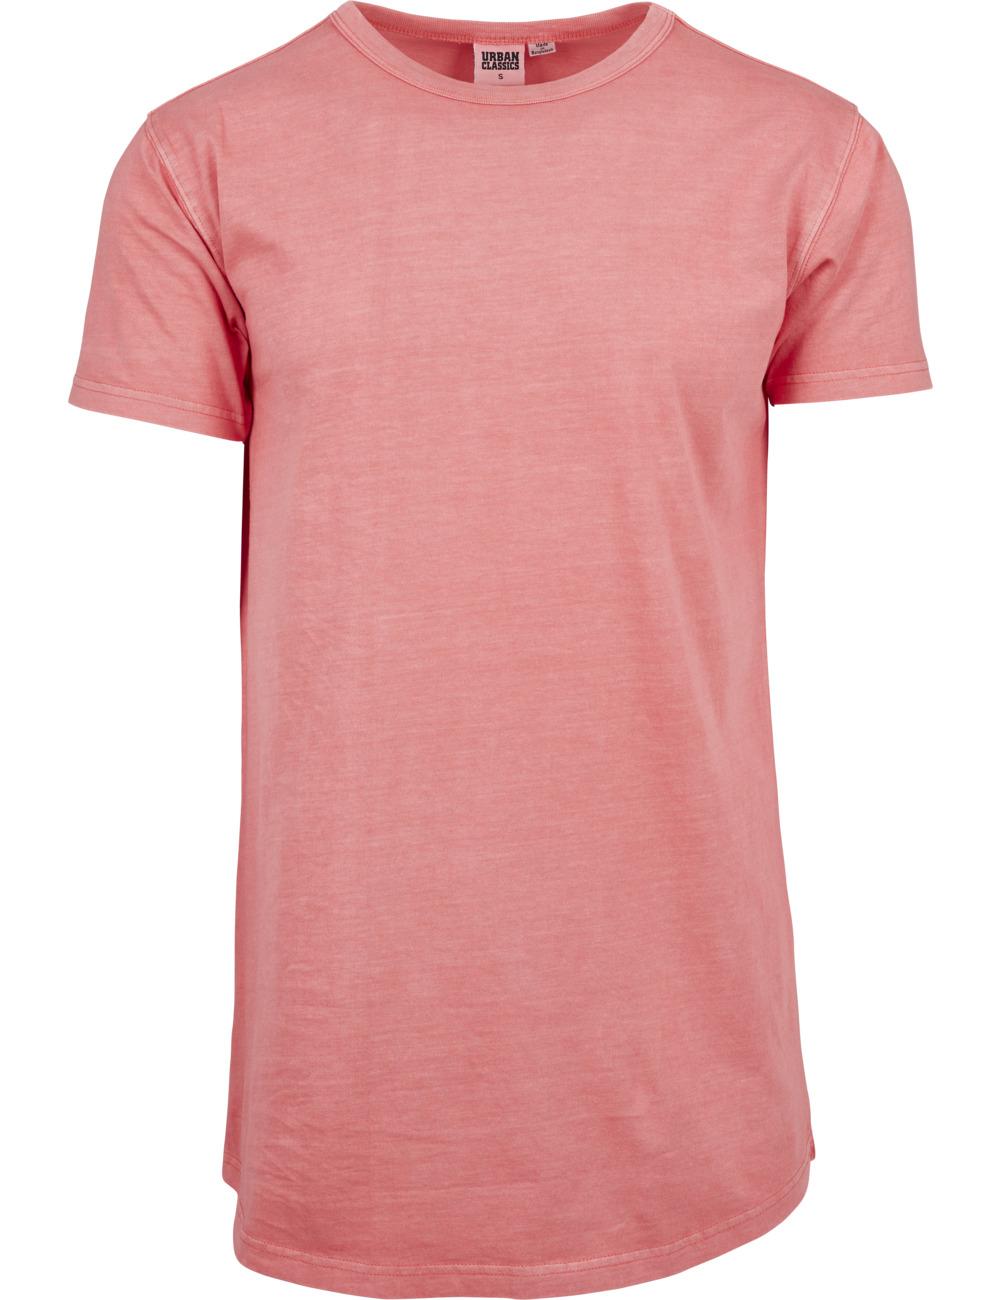 urban-classics-herren-t-shirt-garment-longshape-tee-regular-fit